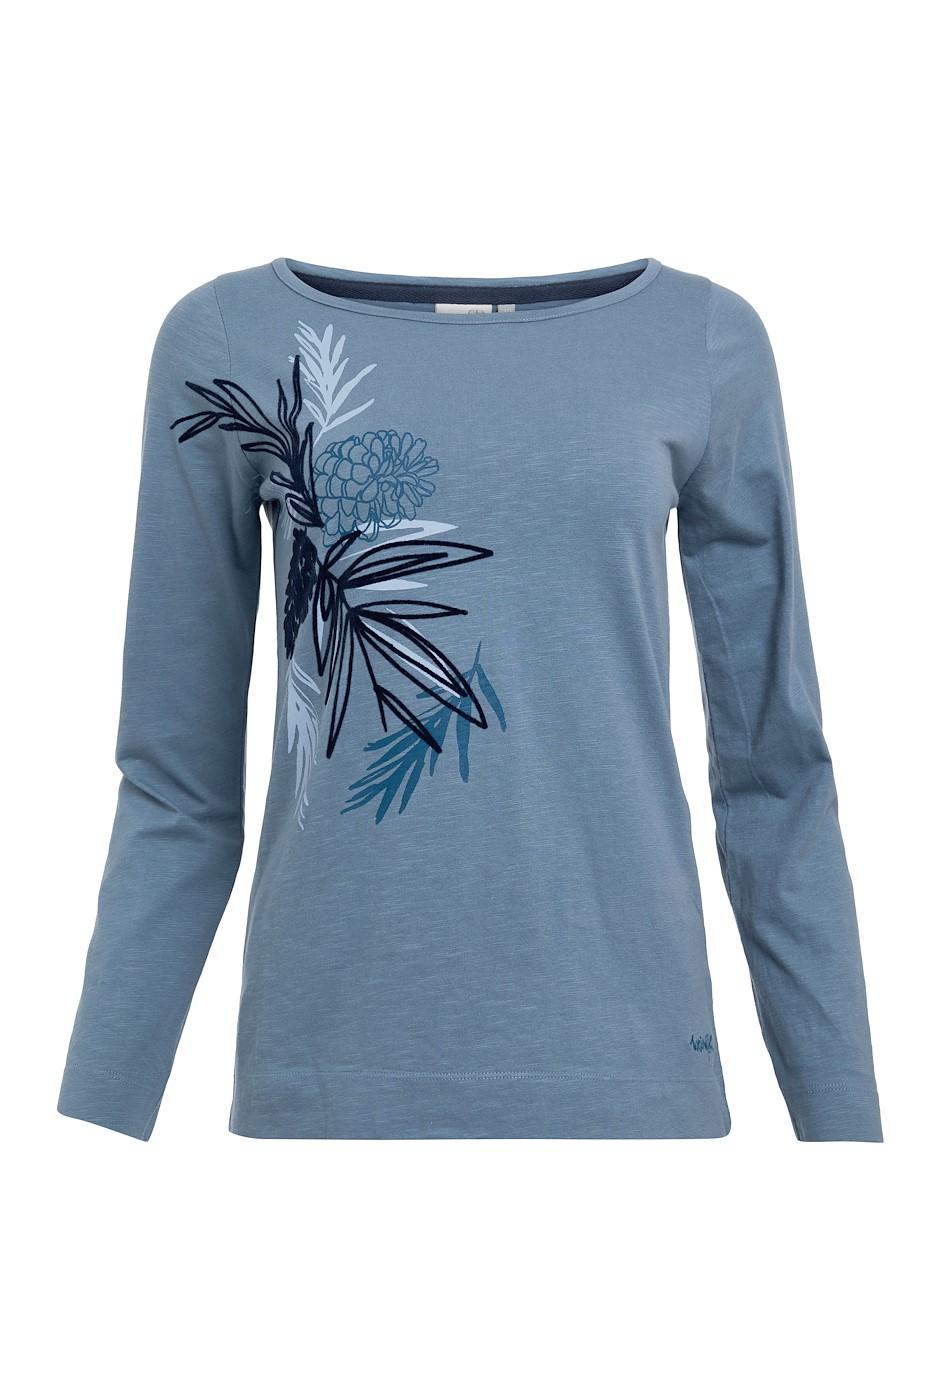 Siris Organic Cotton Long Sleeve Graphic T-Shirt Blue Mirage